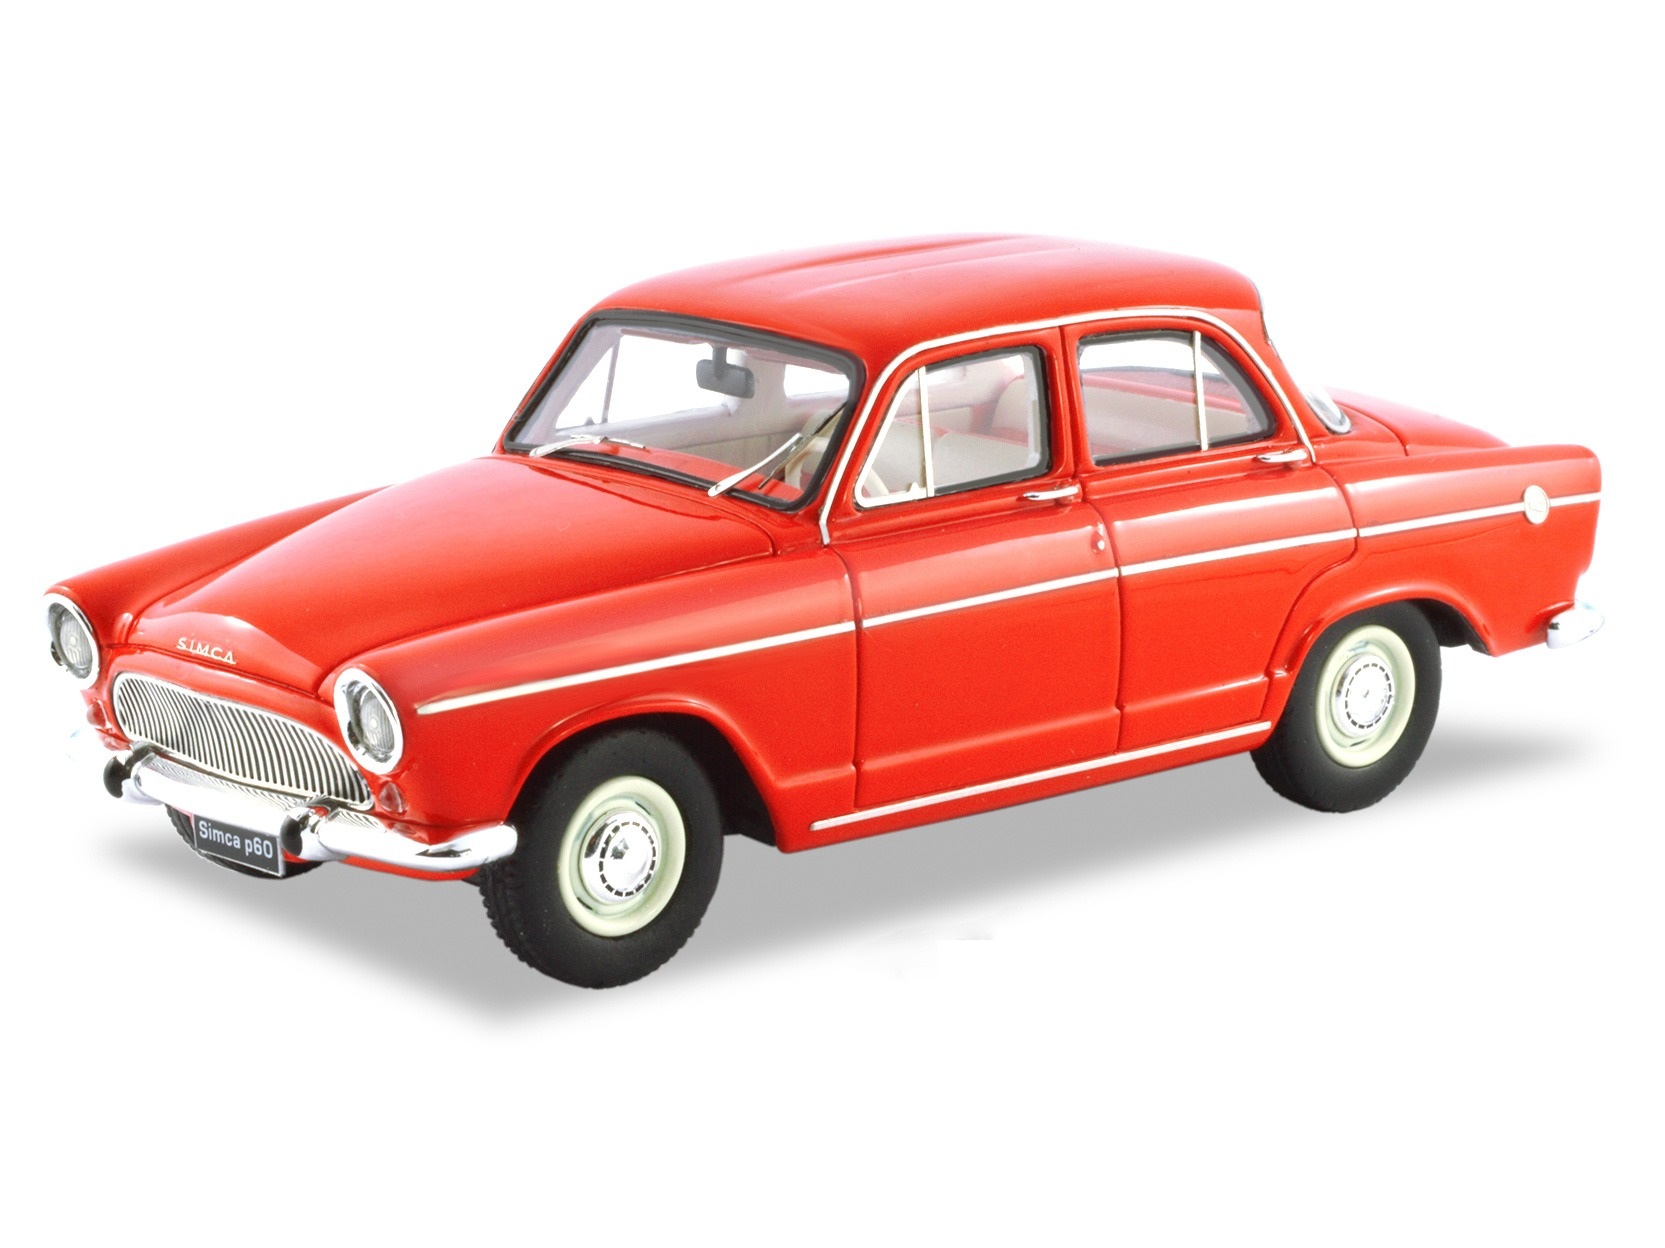 Simca Aronde P60 Sedan – Red